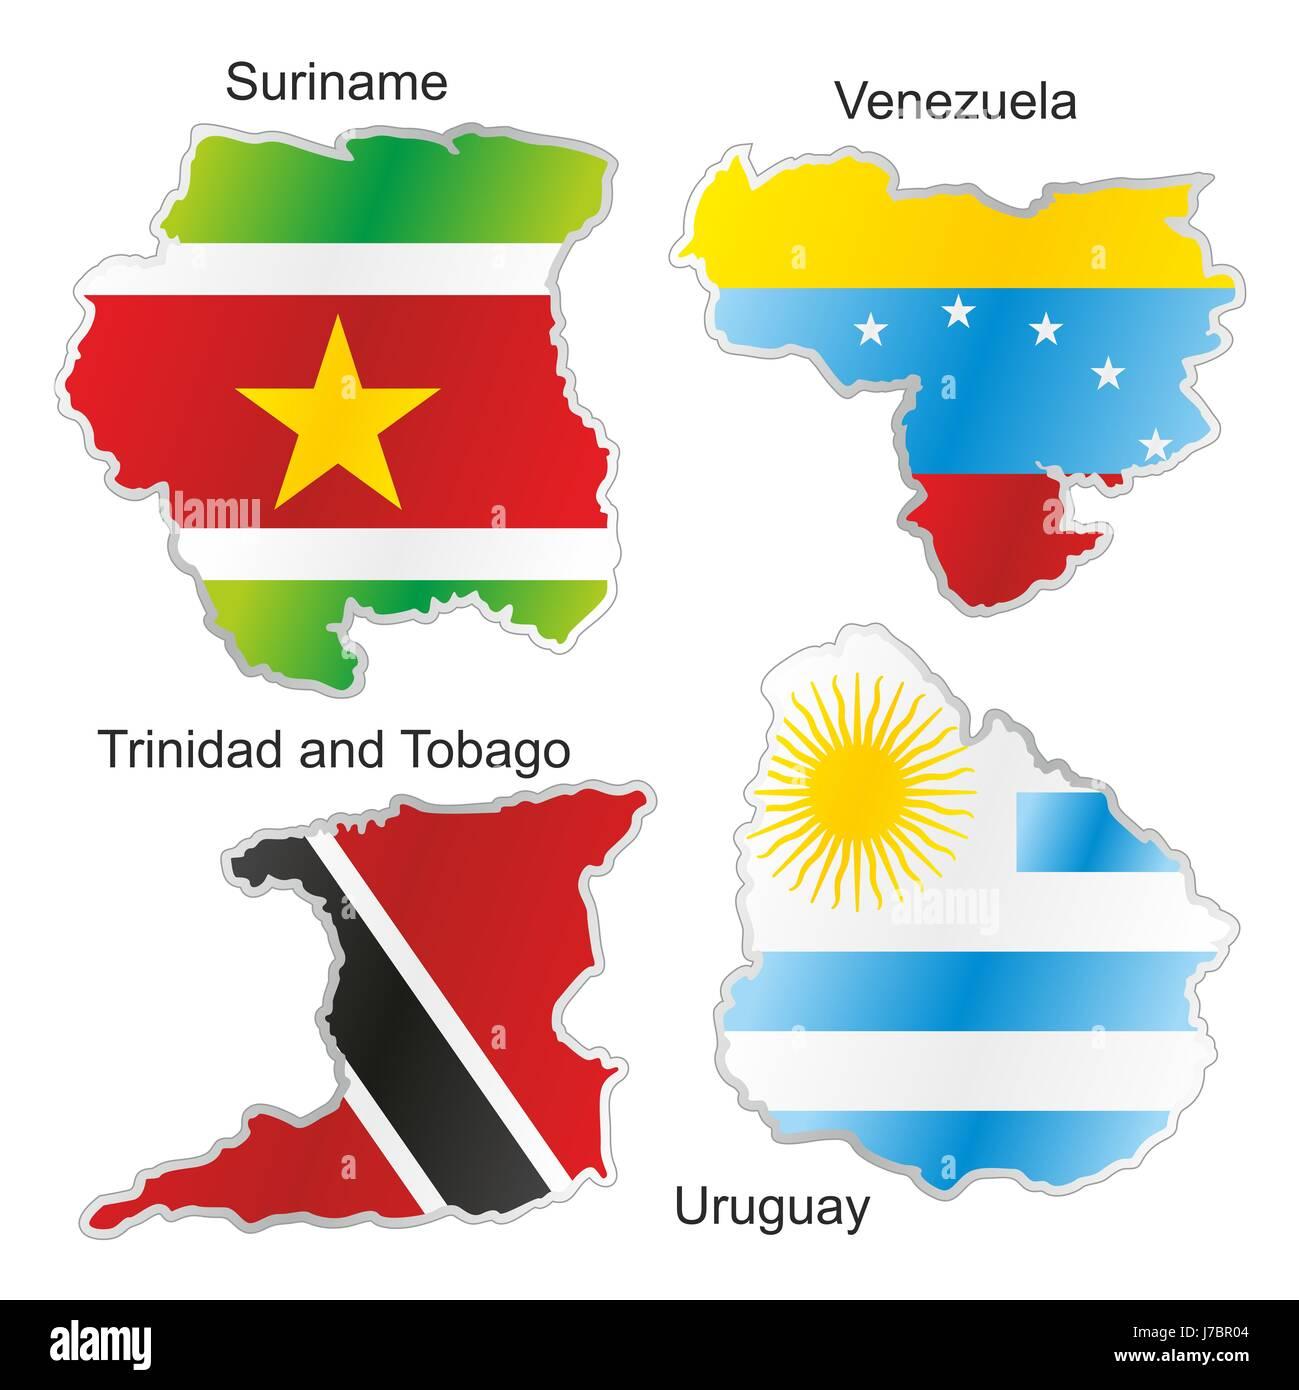 Flag Venezuela Suriname Uruguay Map Atlas Map Of The World - Uruguay map atlas